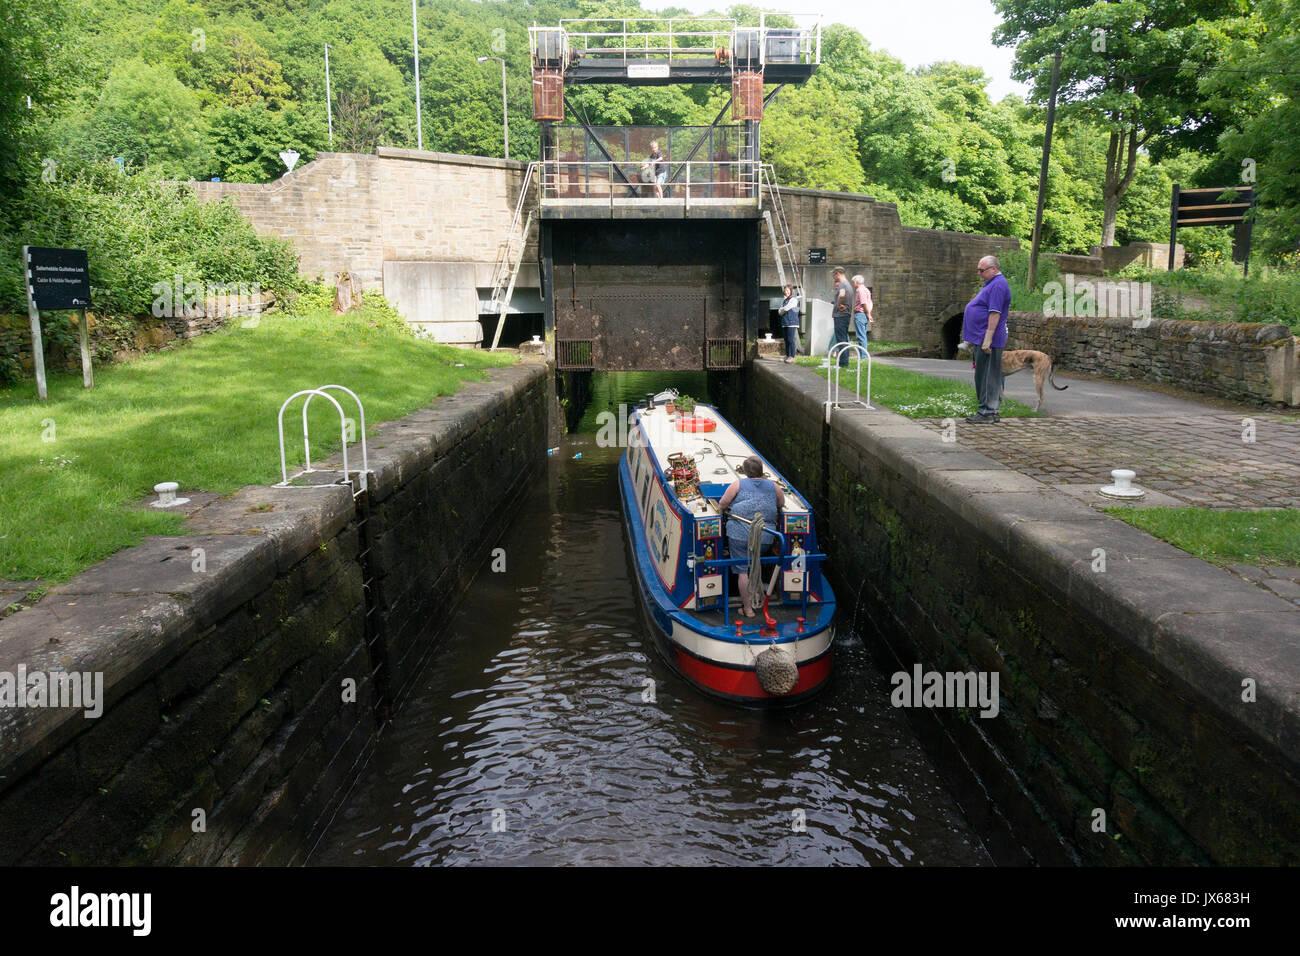 Narrowboat passing through Salterhebble locks on the Calder & Hebble Navigation, Halifax, West Yorkshire - Stock Image